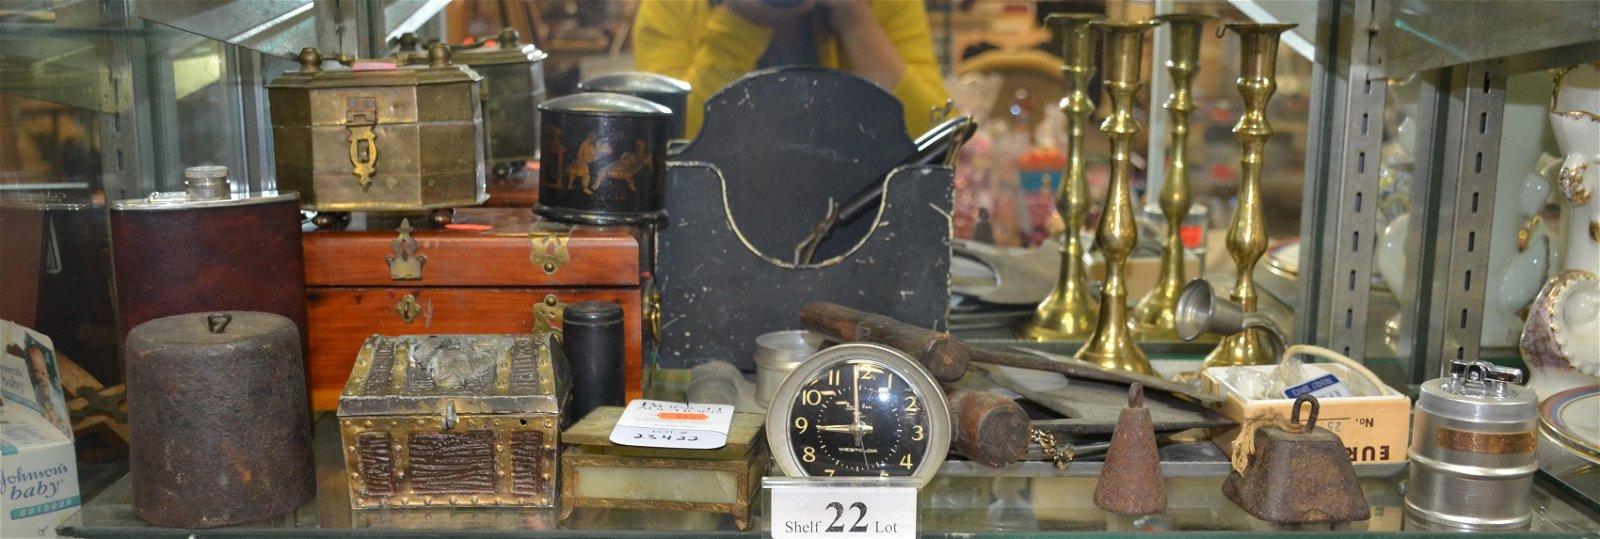 Shelf #22 - Wood, Brass and Metal Items